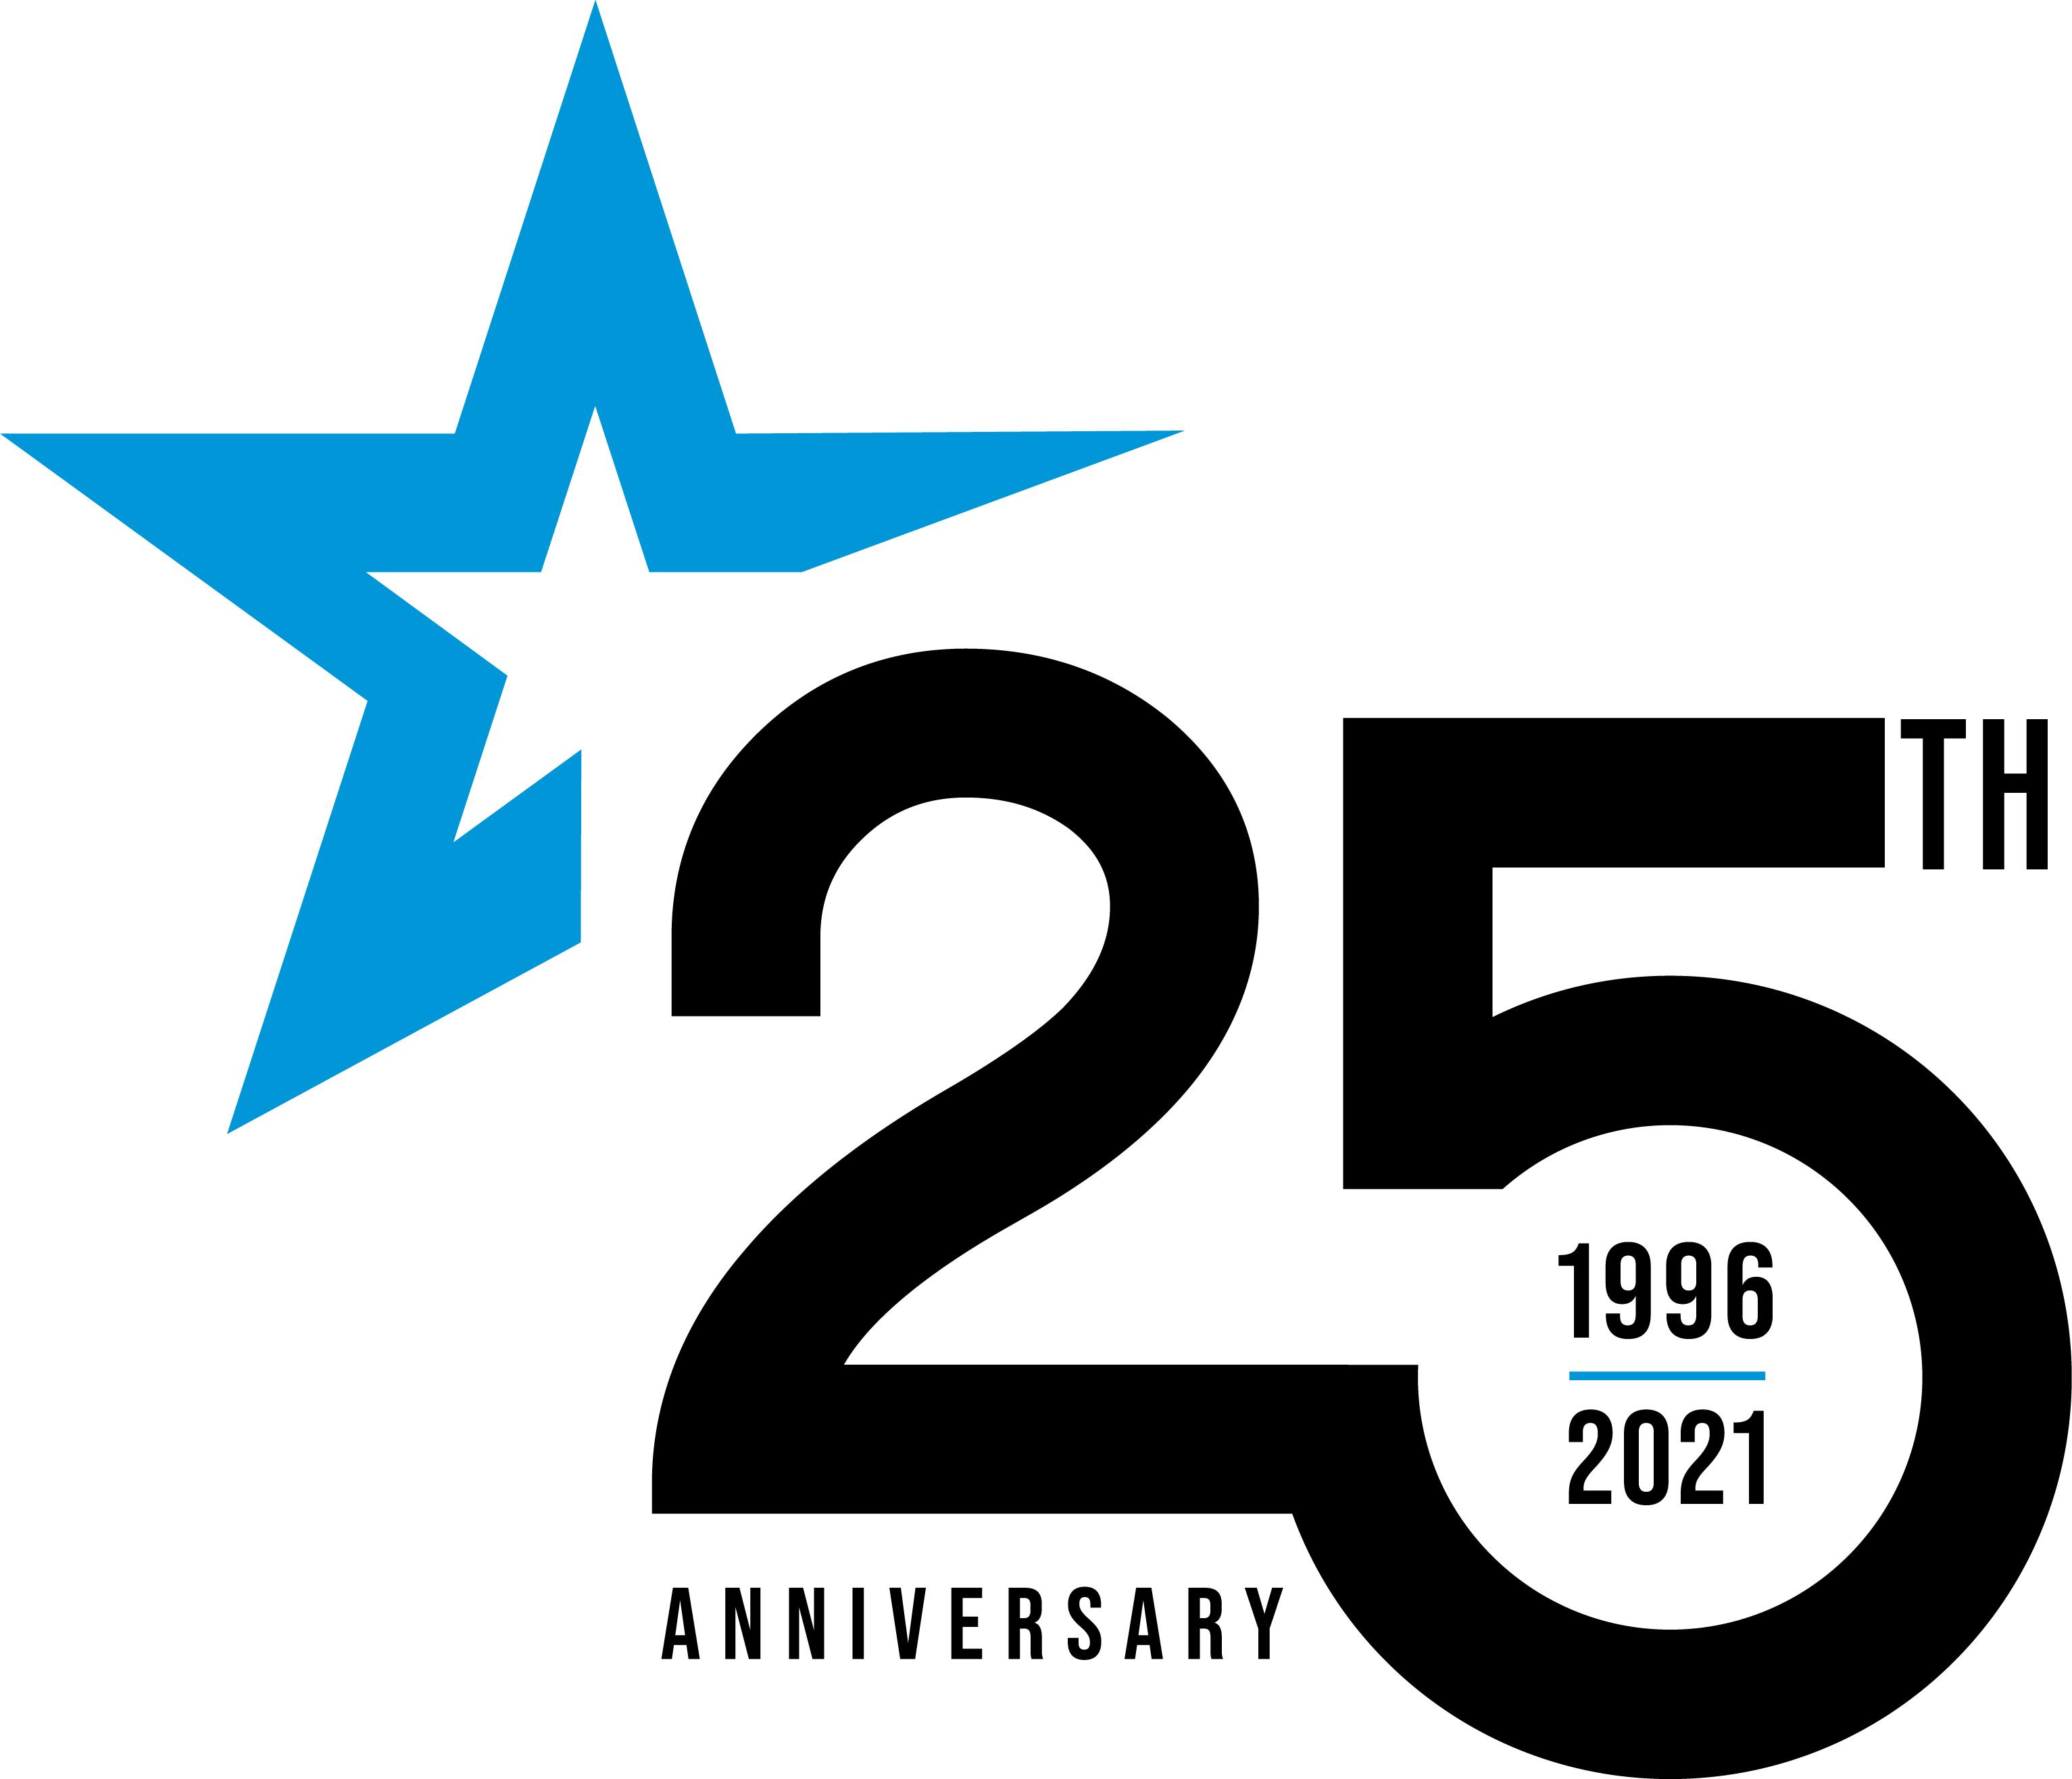 Insala's 25th anniversary logo